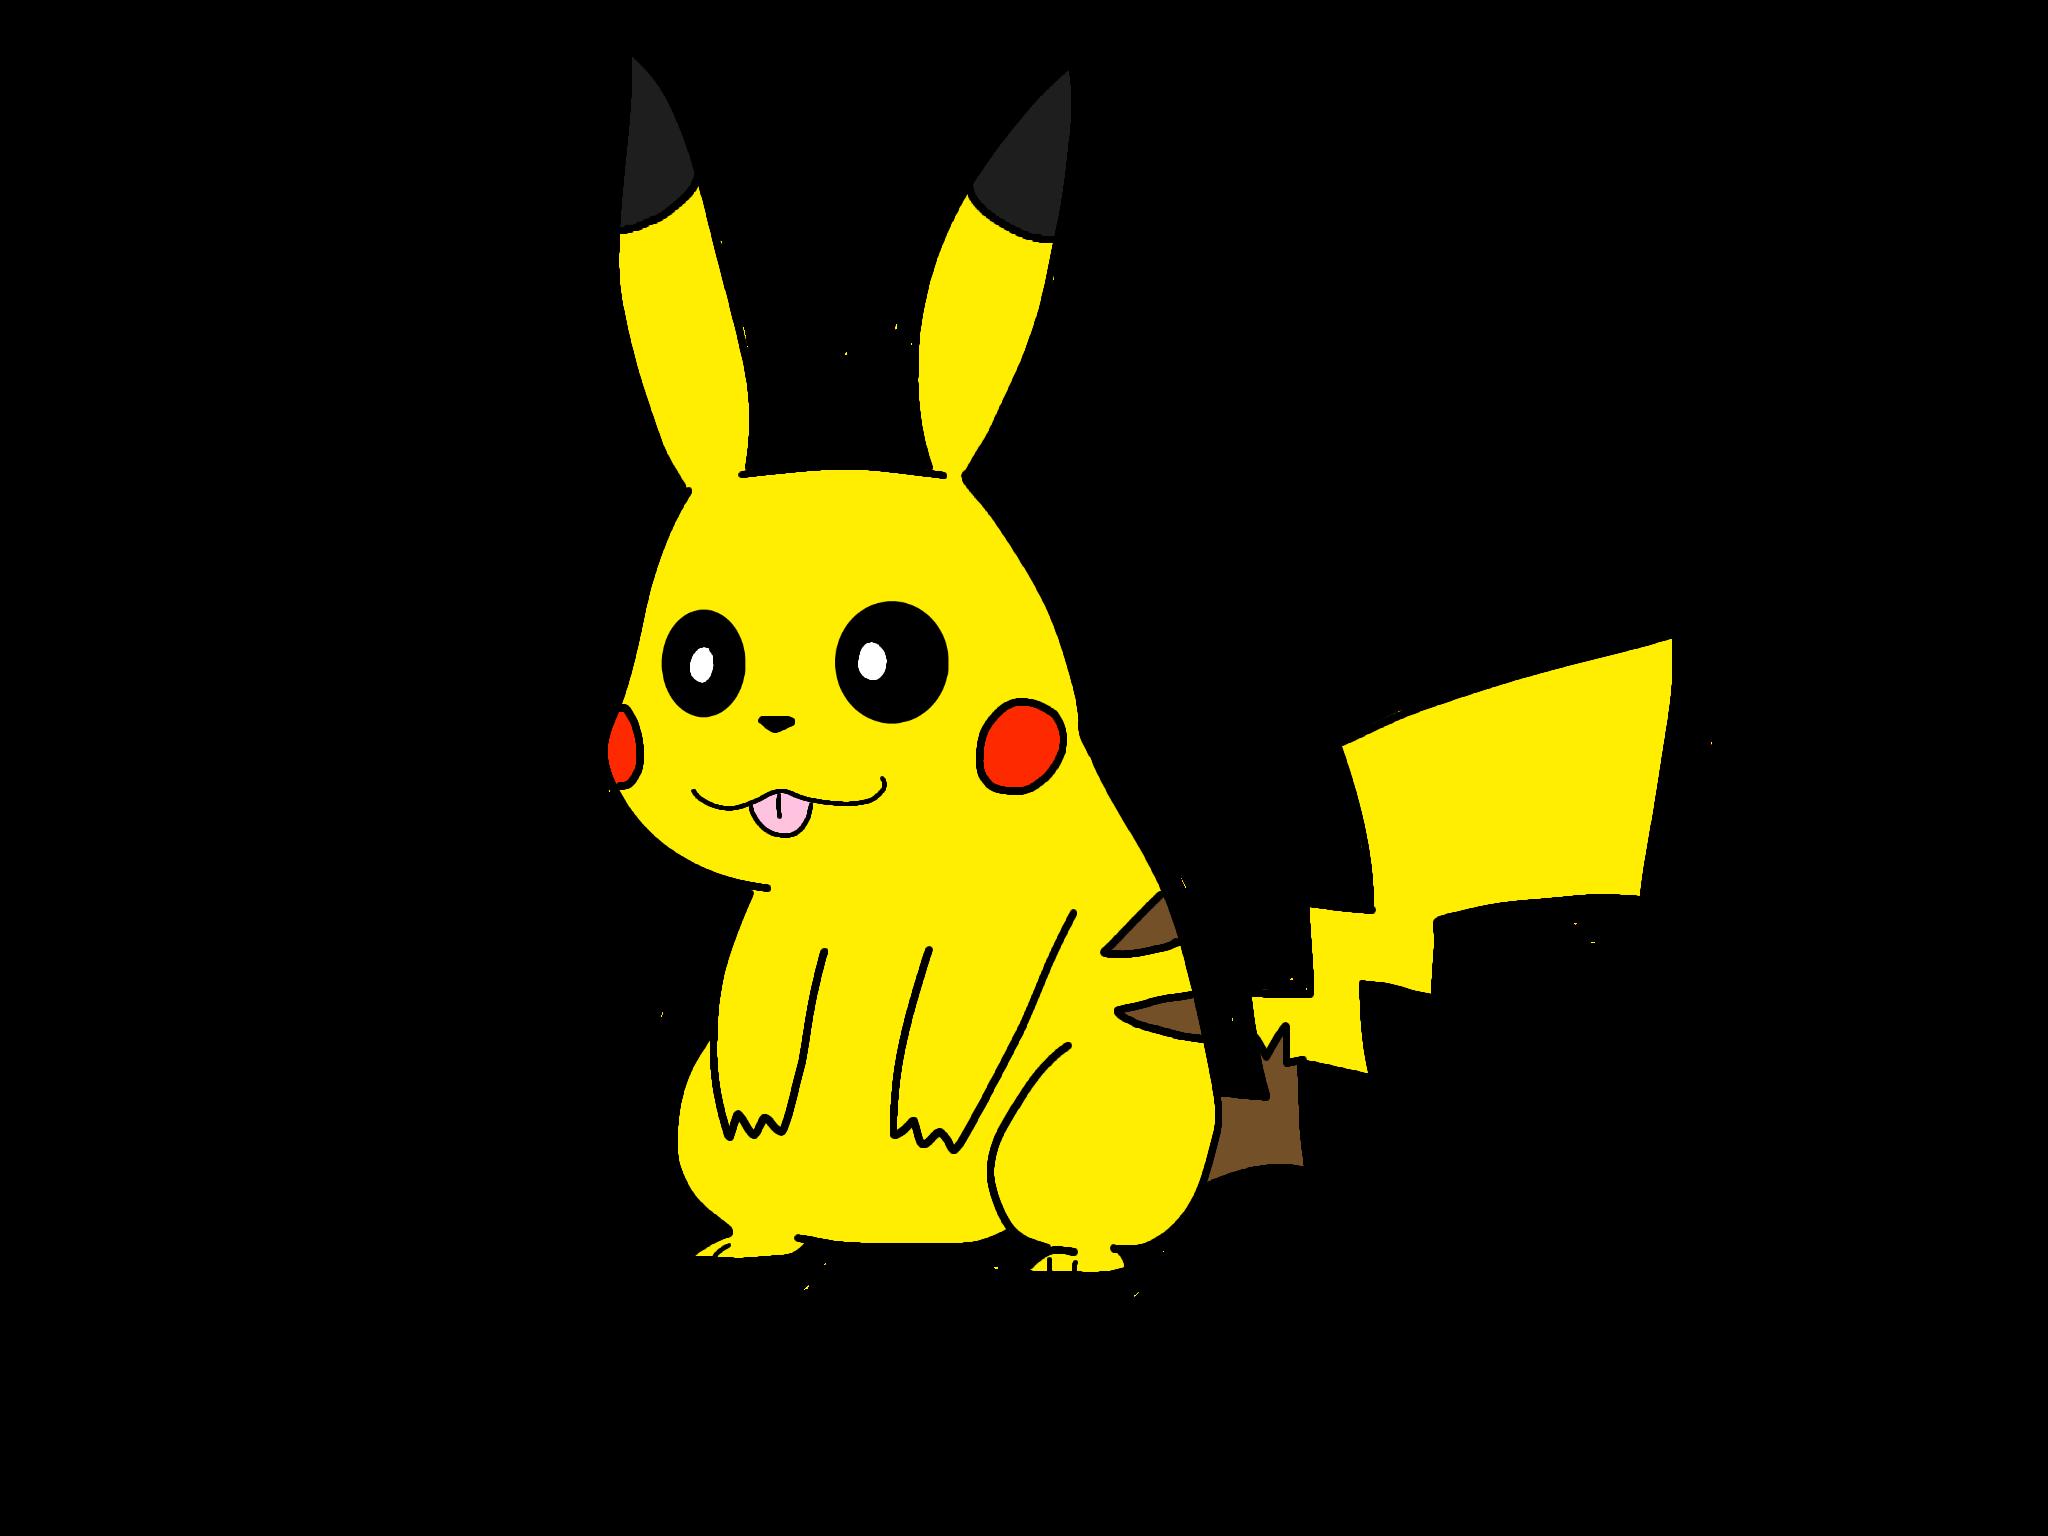 2048x1536 Pikachu Drawing Pikachudrawing Pokemon Fat Chun